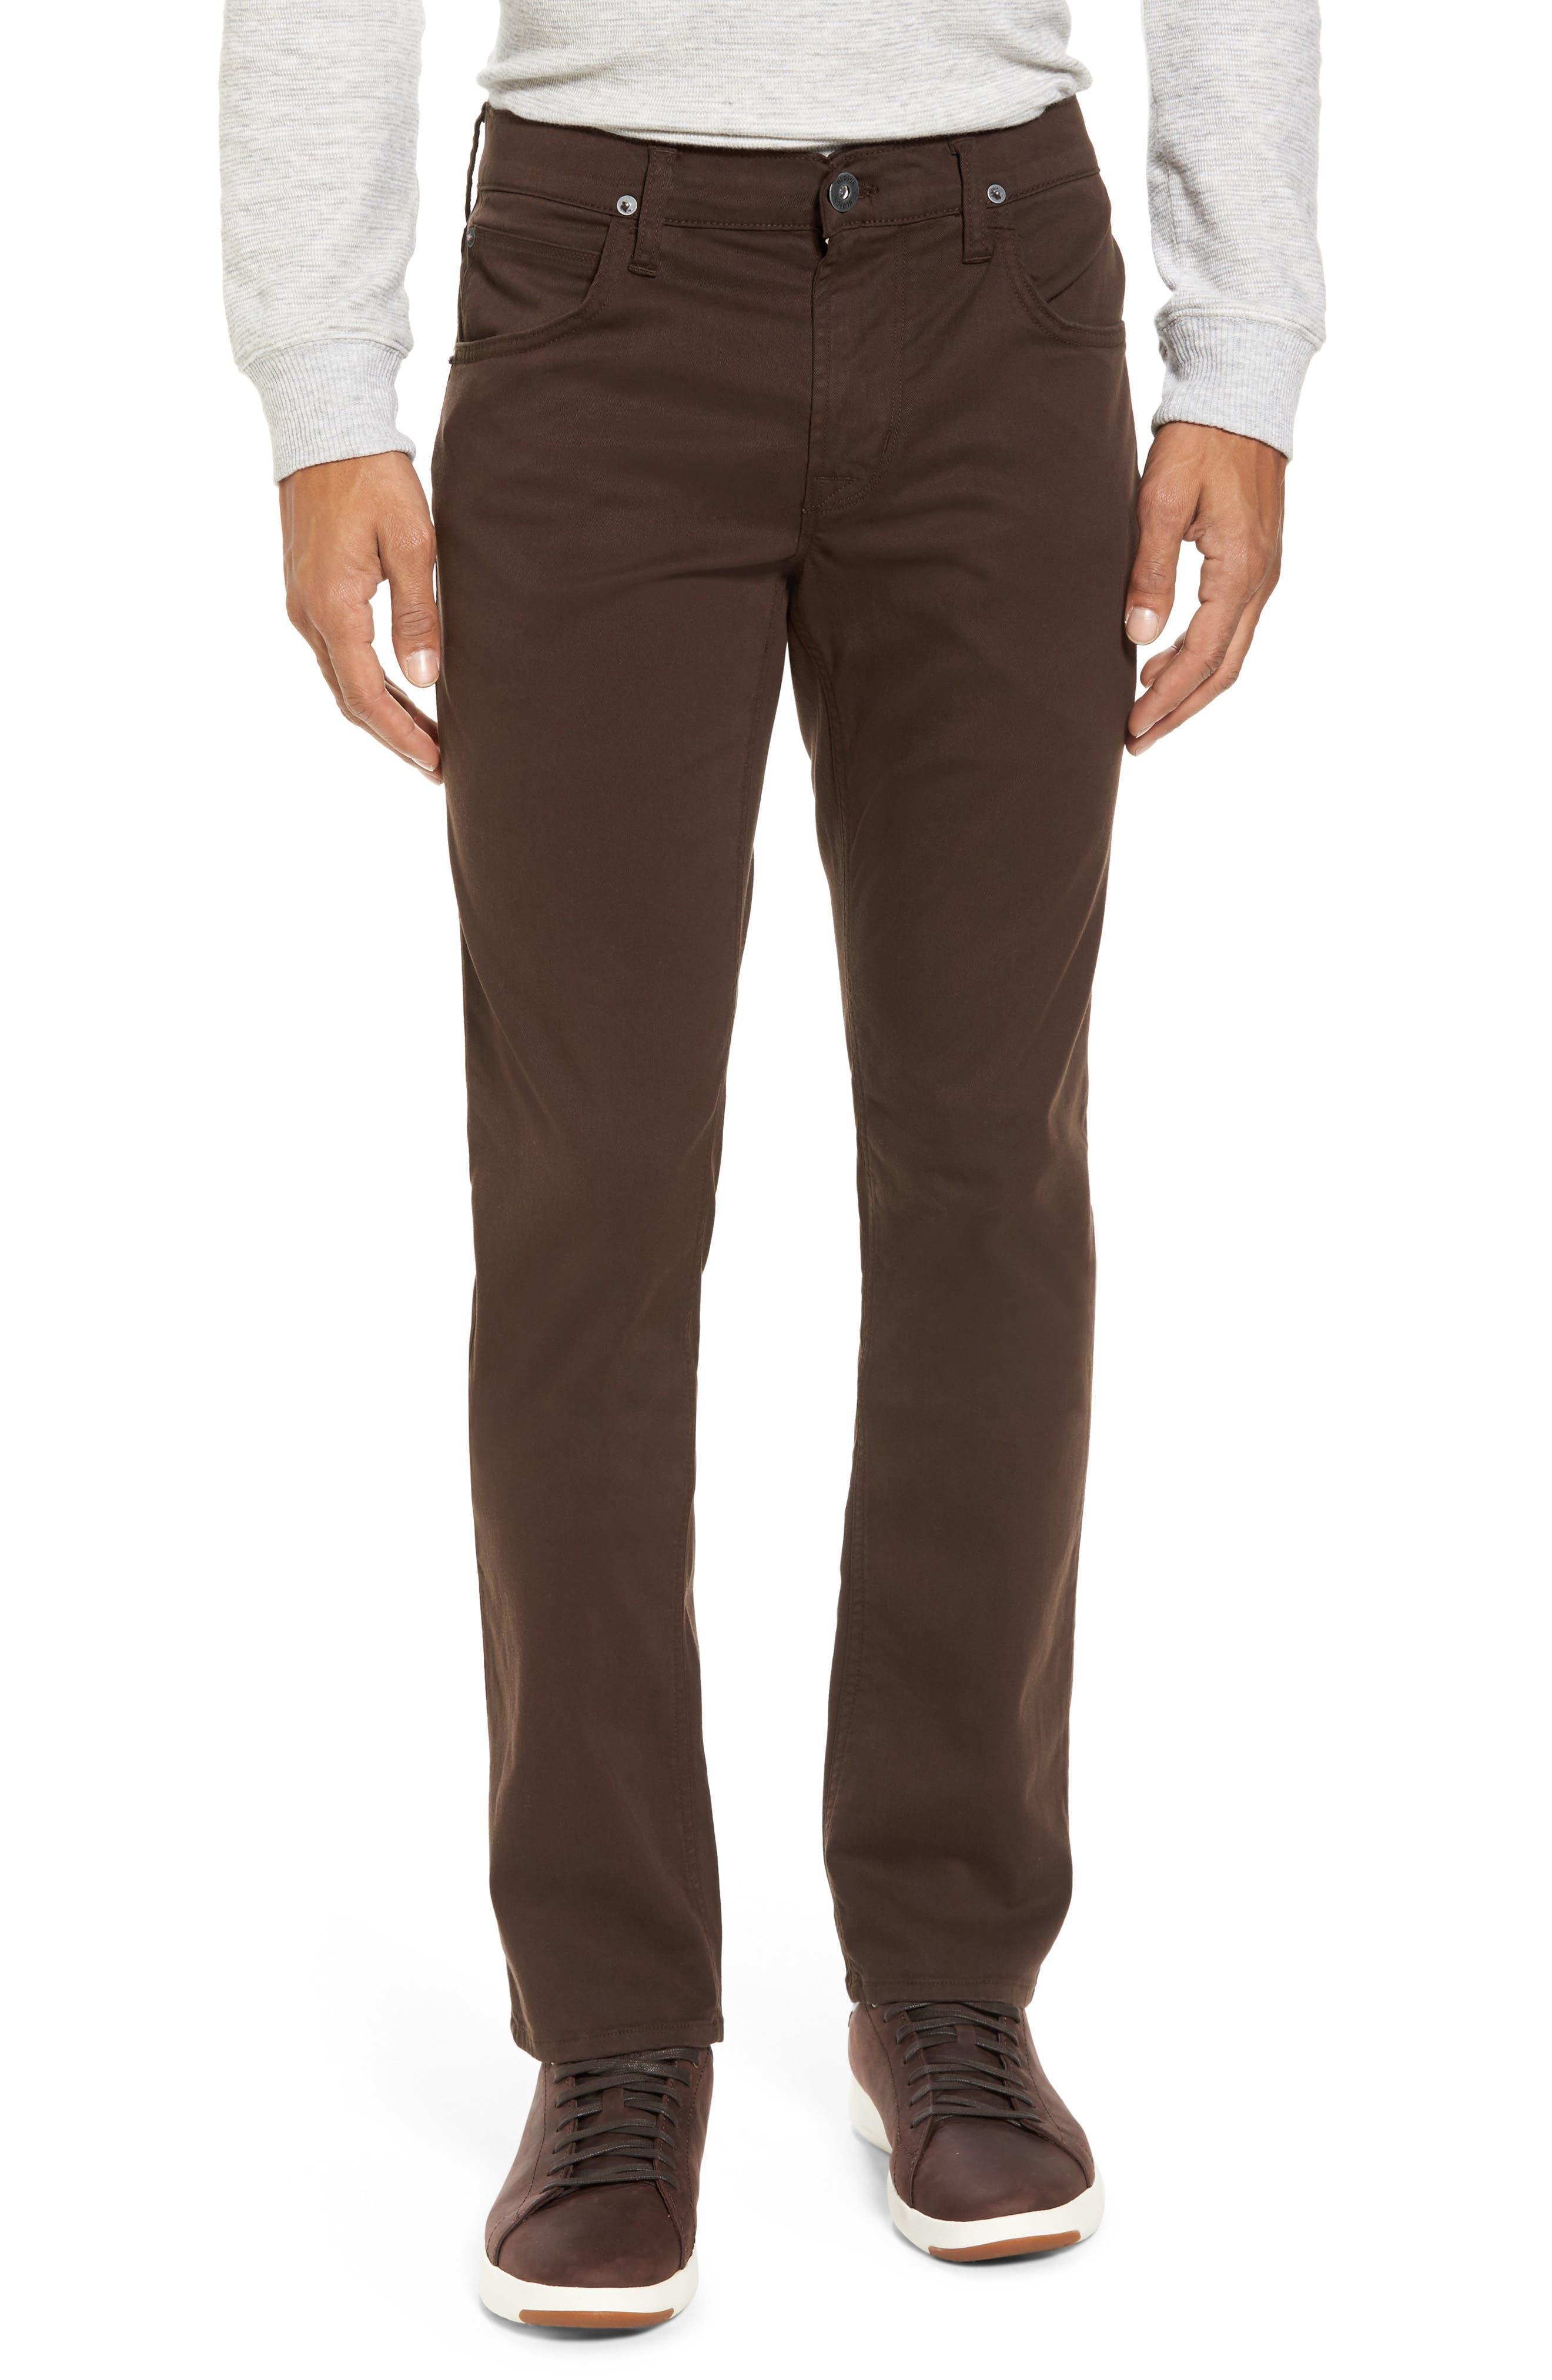 Main Image - Hudson Jeans Blake Slim Fit Jeans (Brew)